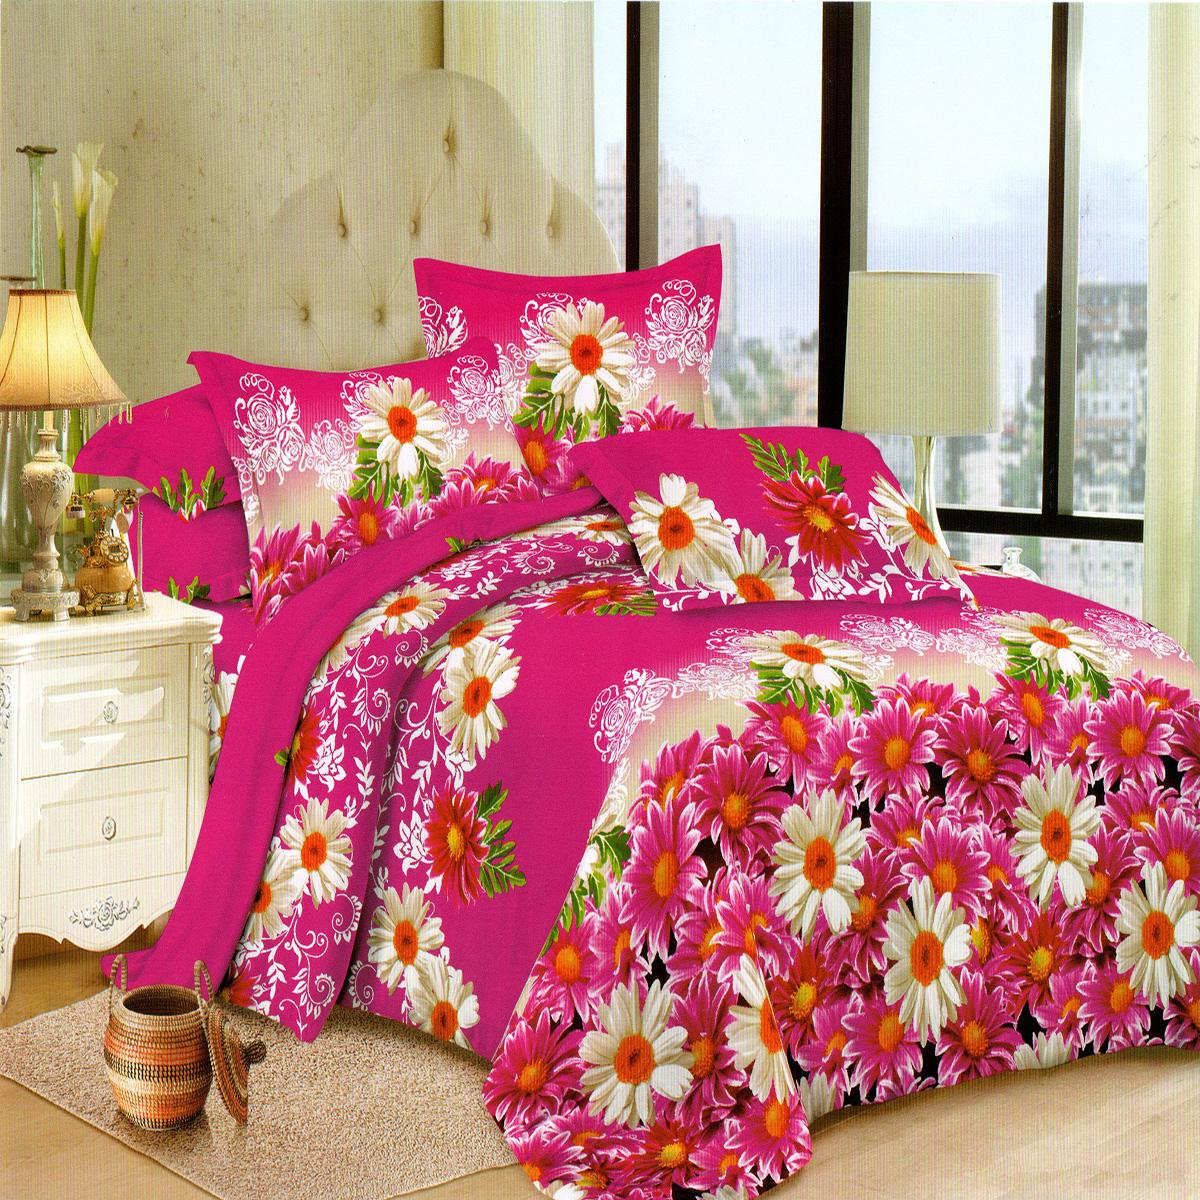 Buy Sell Cheapest Seprai D 39 Best Quality Product Deals Kintakun Sprei Dluxe 160 X 200 B2 Queen Azaki Nayley King Motif 3d San 1182 180x200 Cm